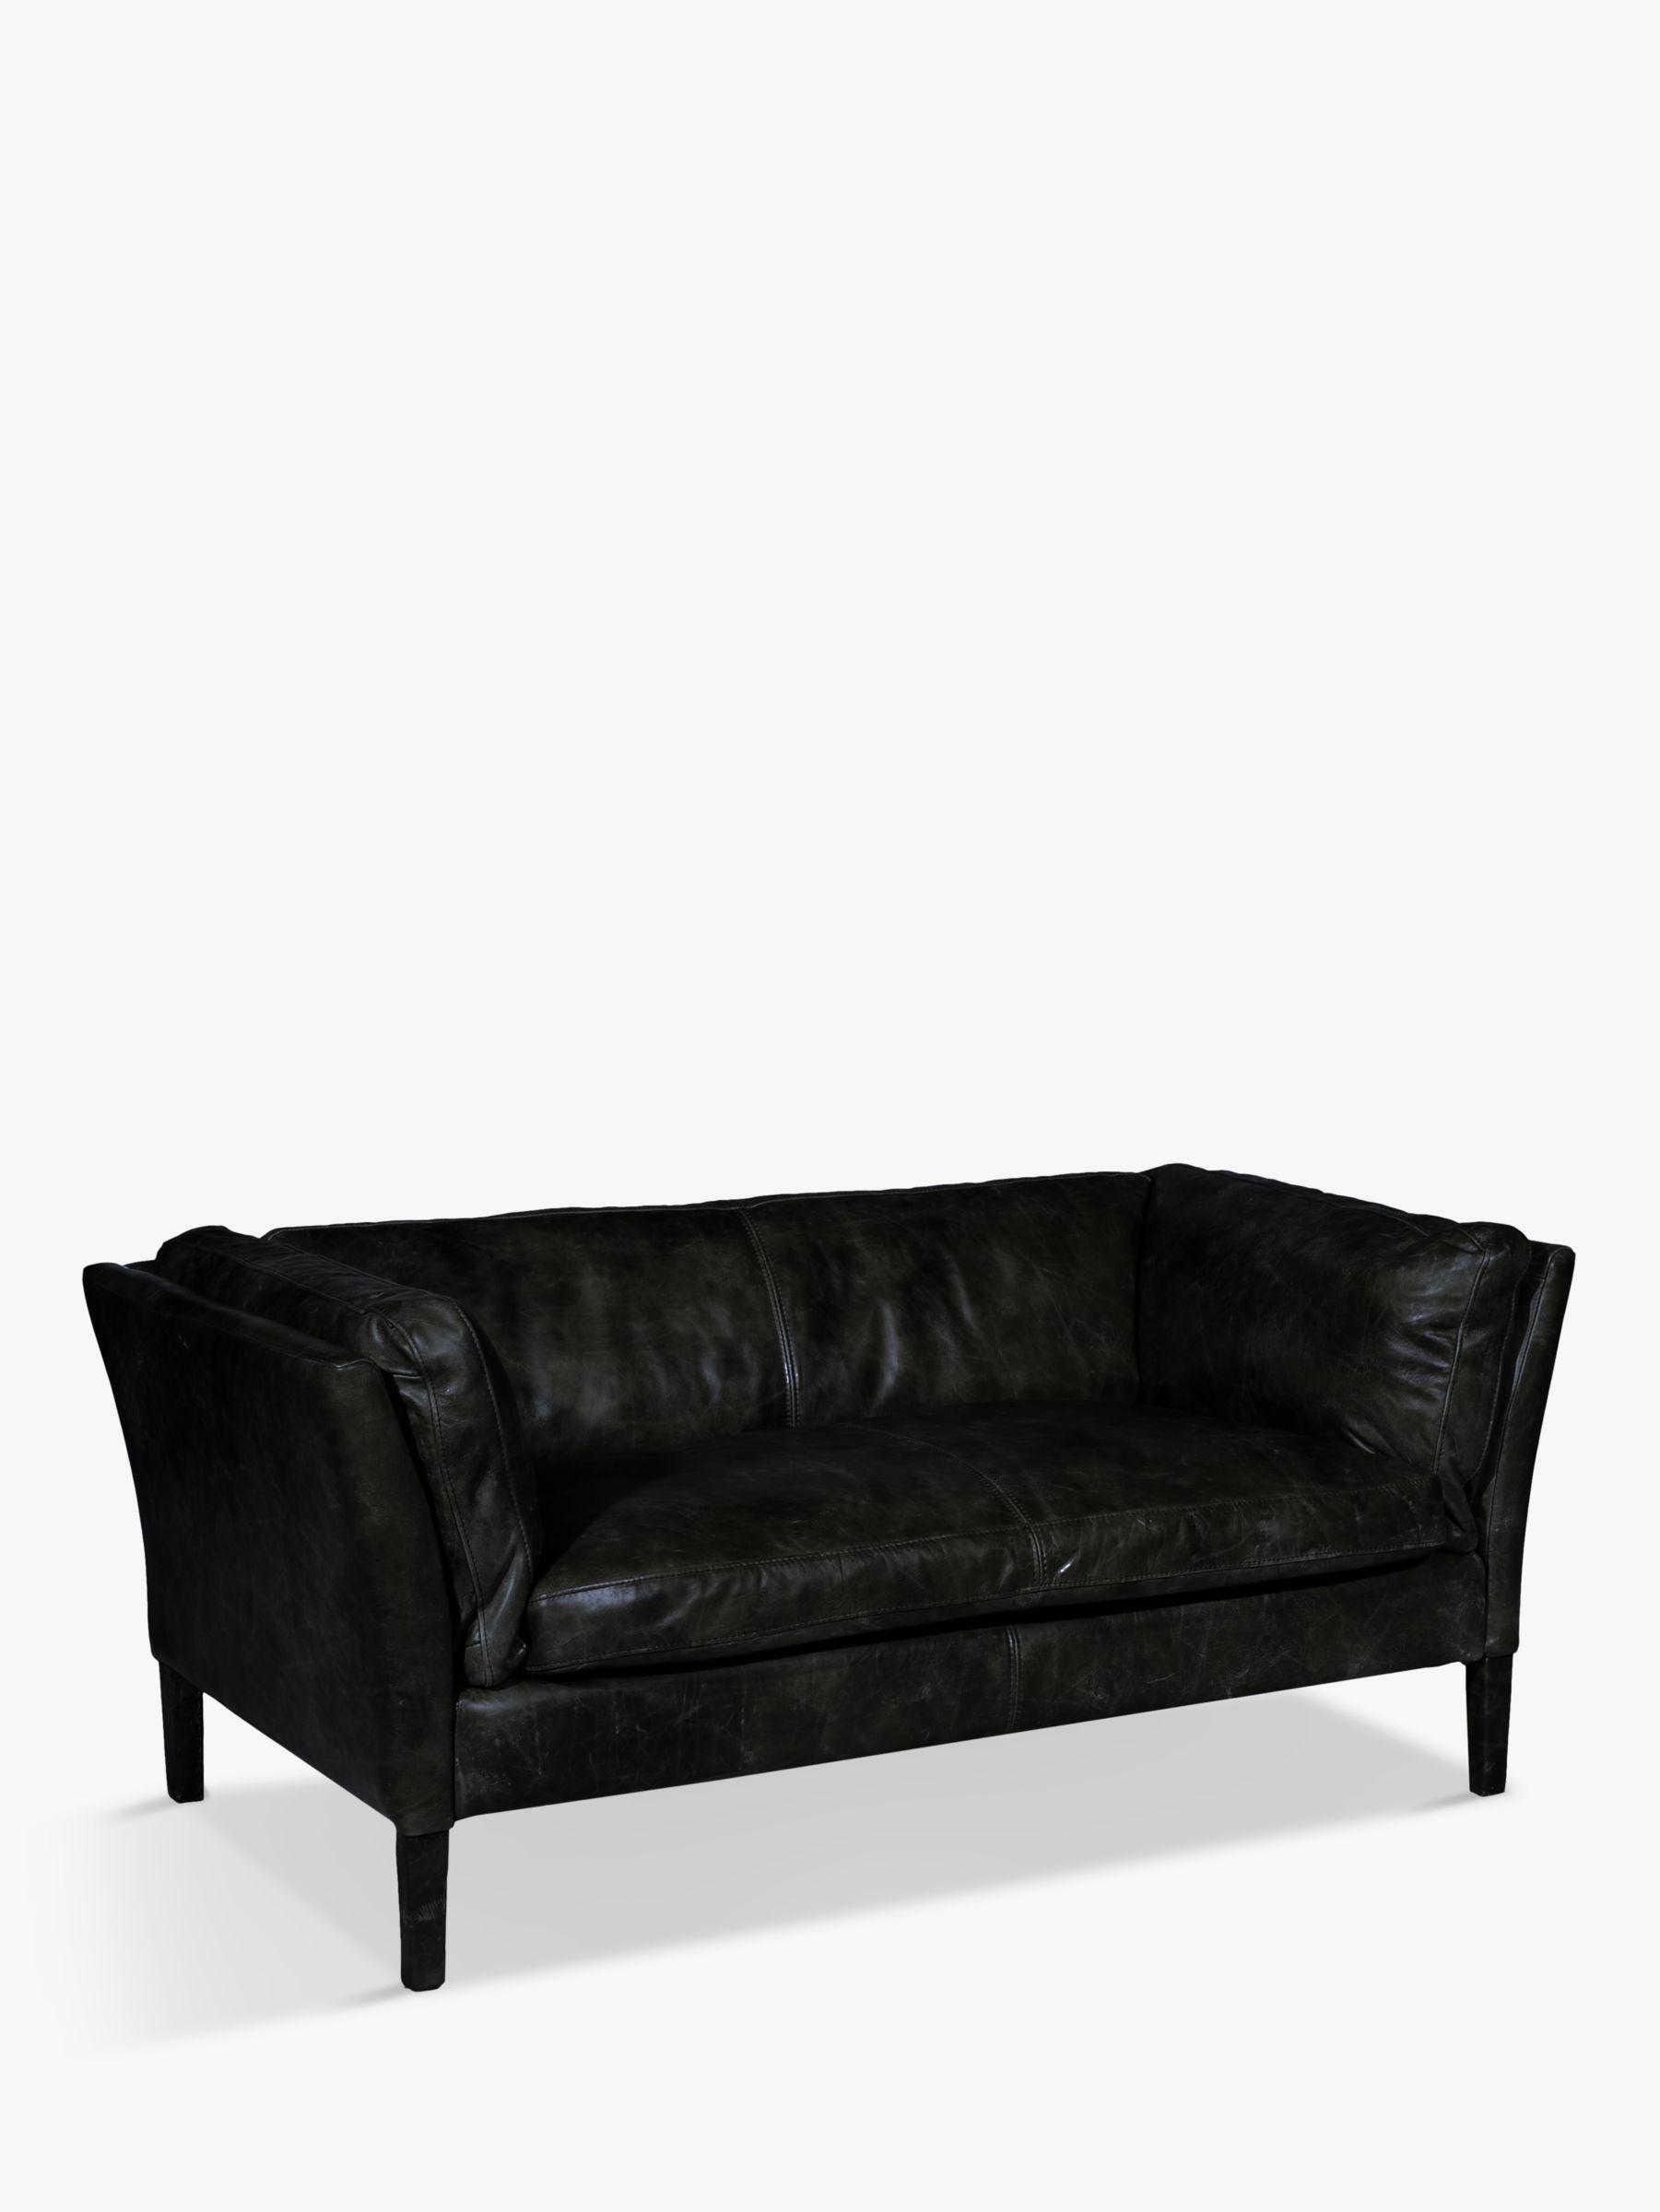 Halo Halo Groucho Medium Aniline Leather Sofa